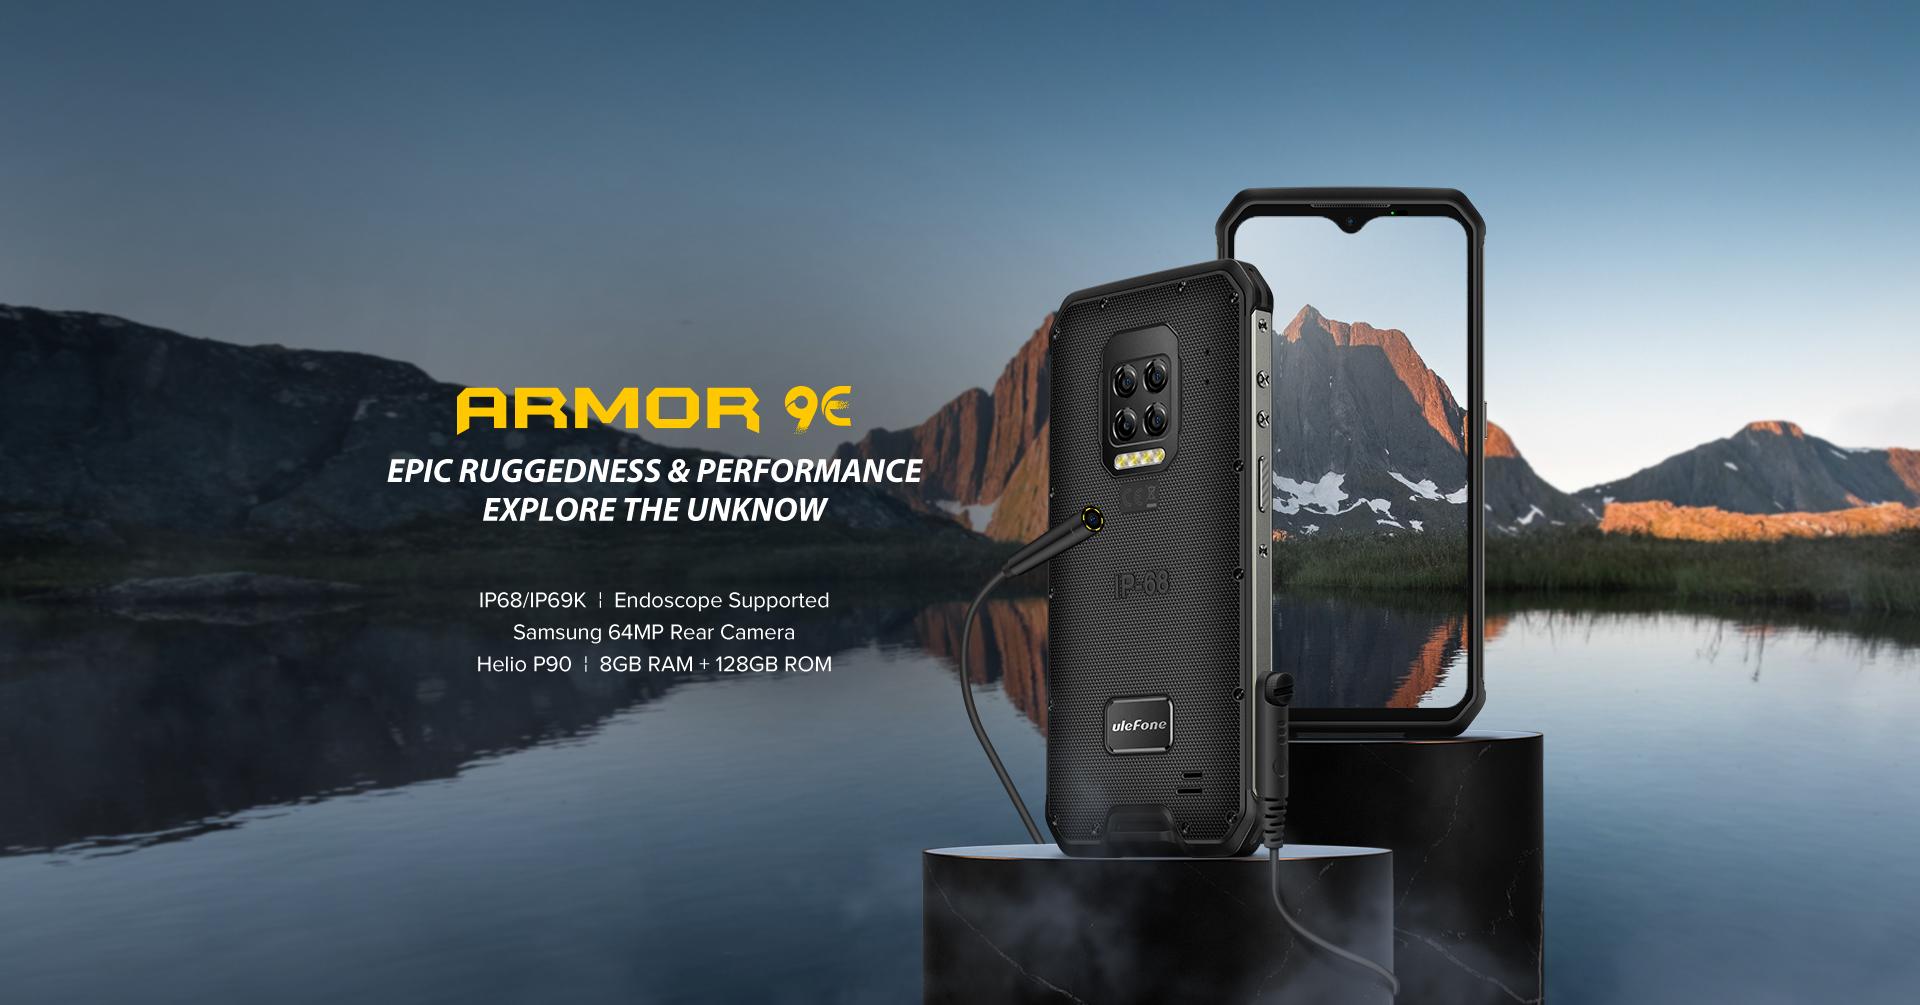 Ulefone Online Store Armor 9E